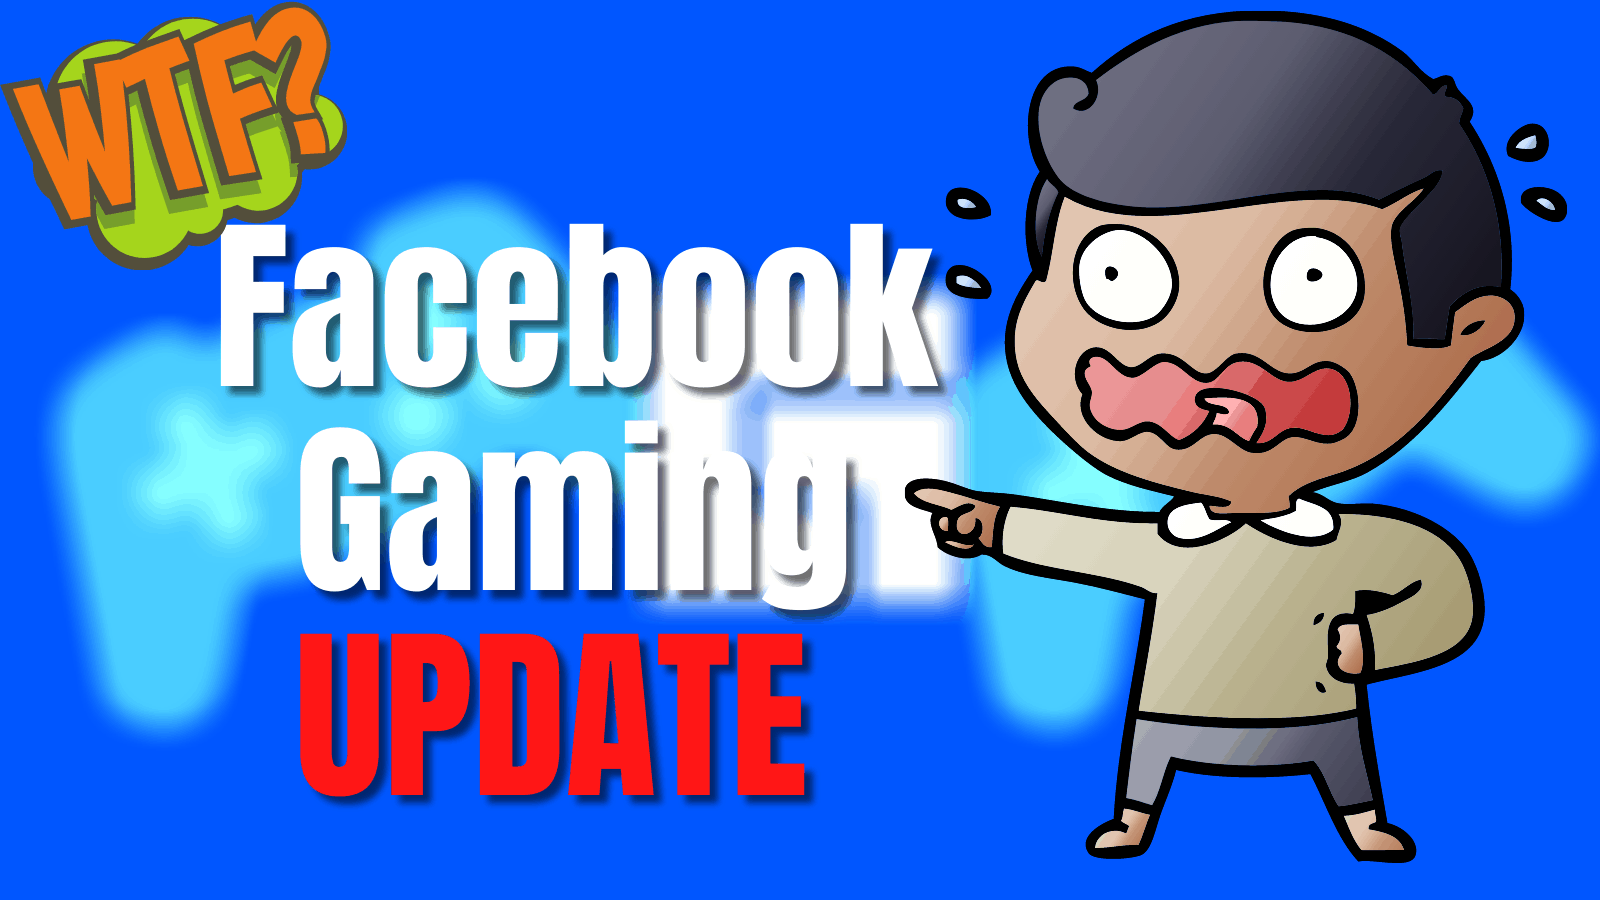 Facebook gaming update